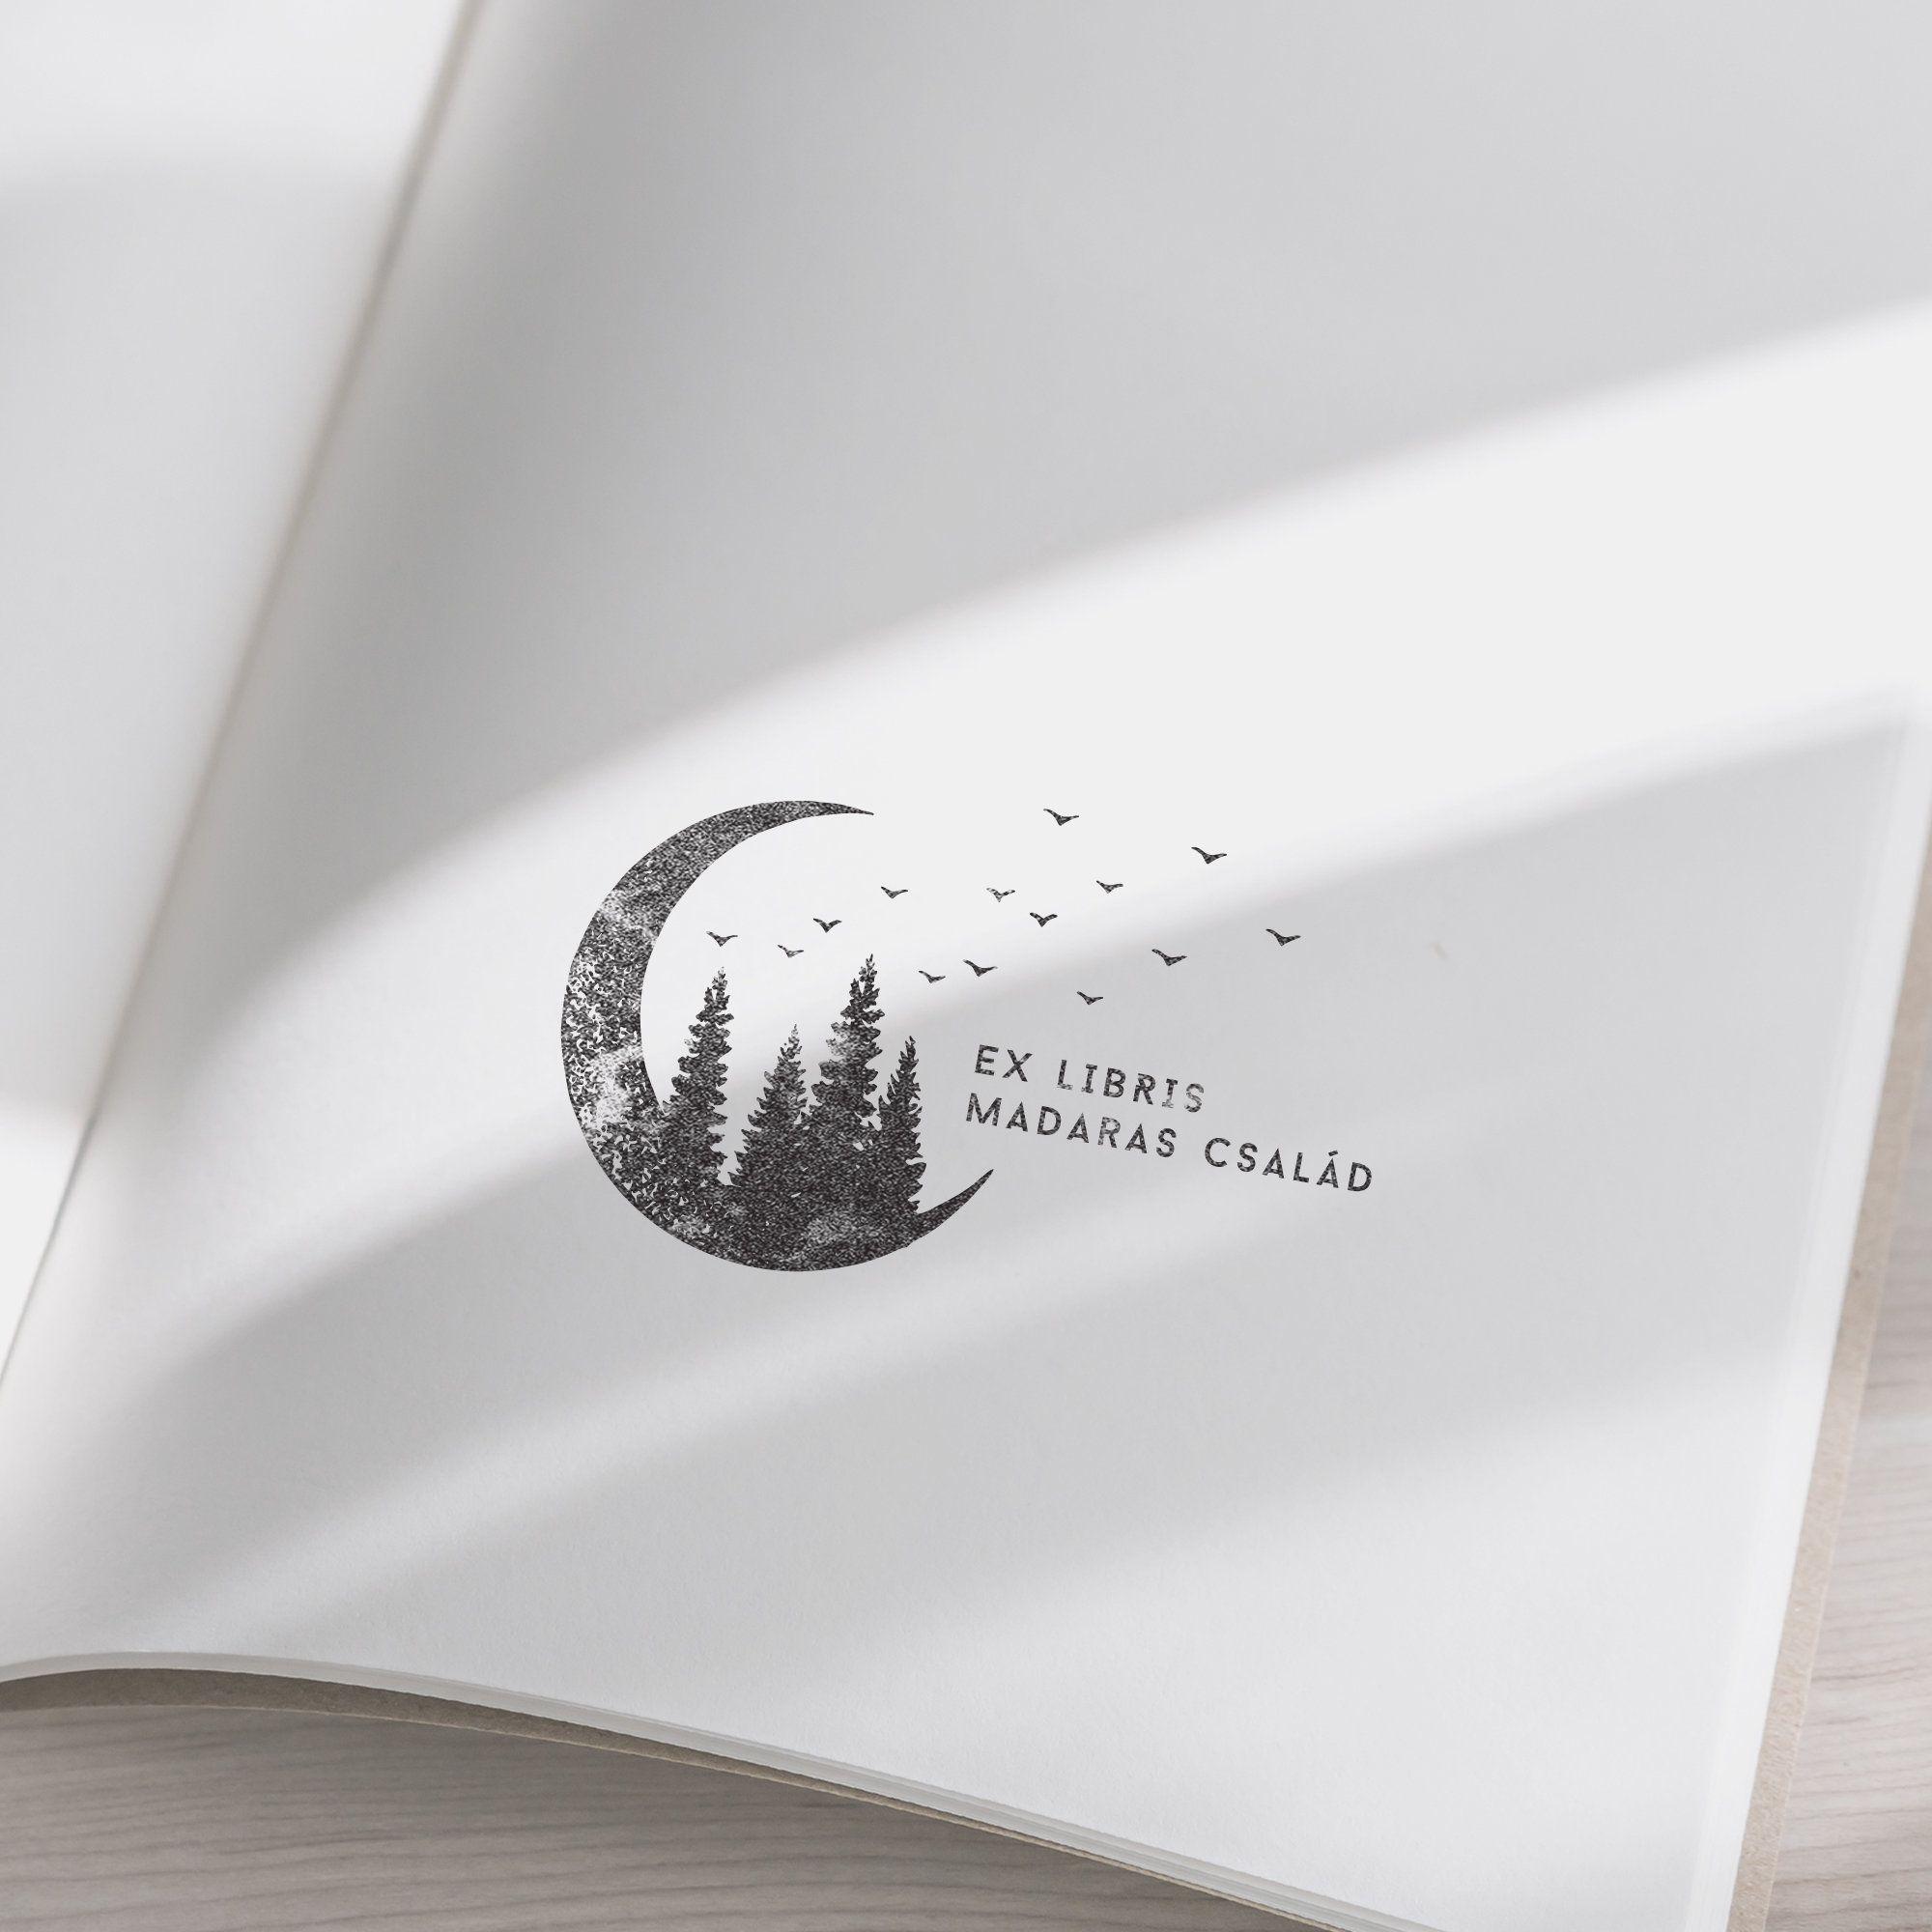 1153081019-- Bird Bookplate Stamp Bird Custom Ex Libris Bookplate Personalizable Gift Idea Book Stamp Book Lovers Gift Sellos Stempel